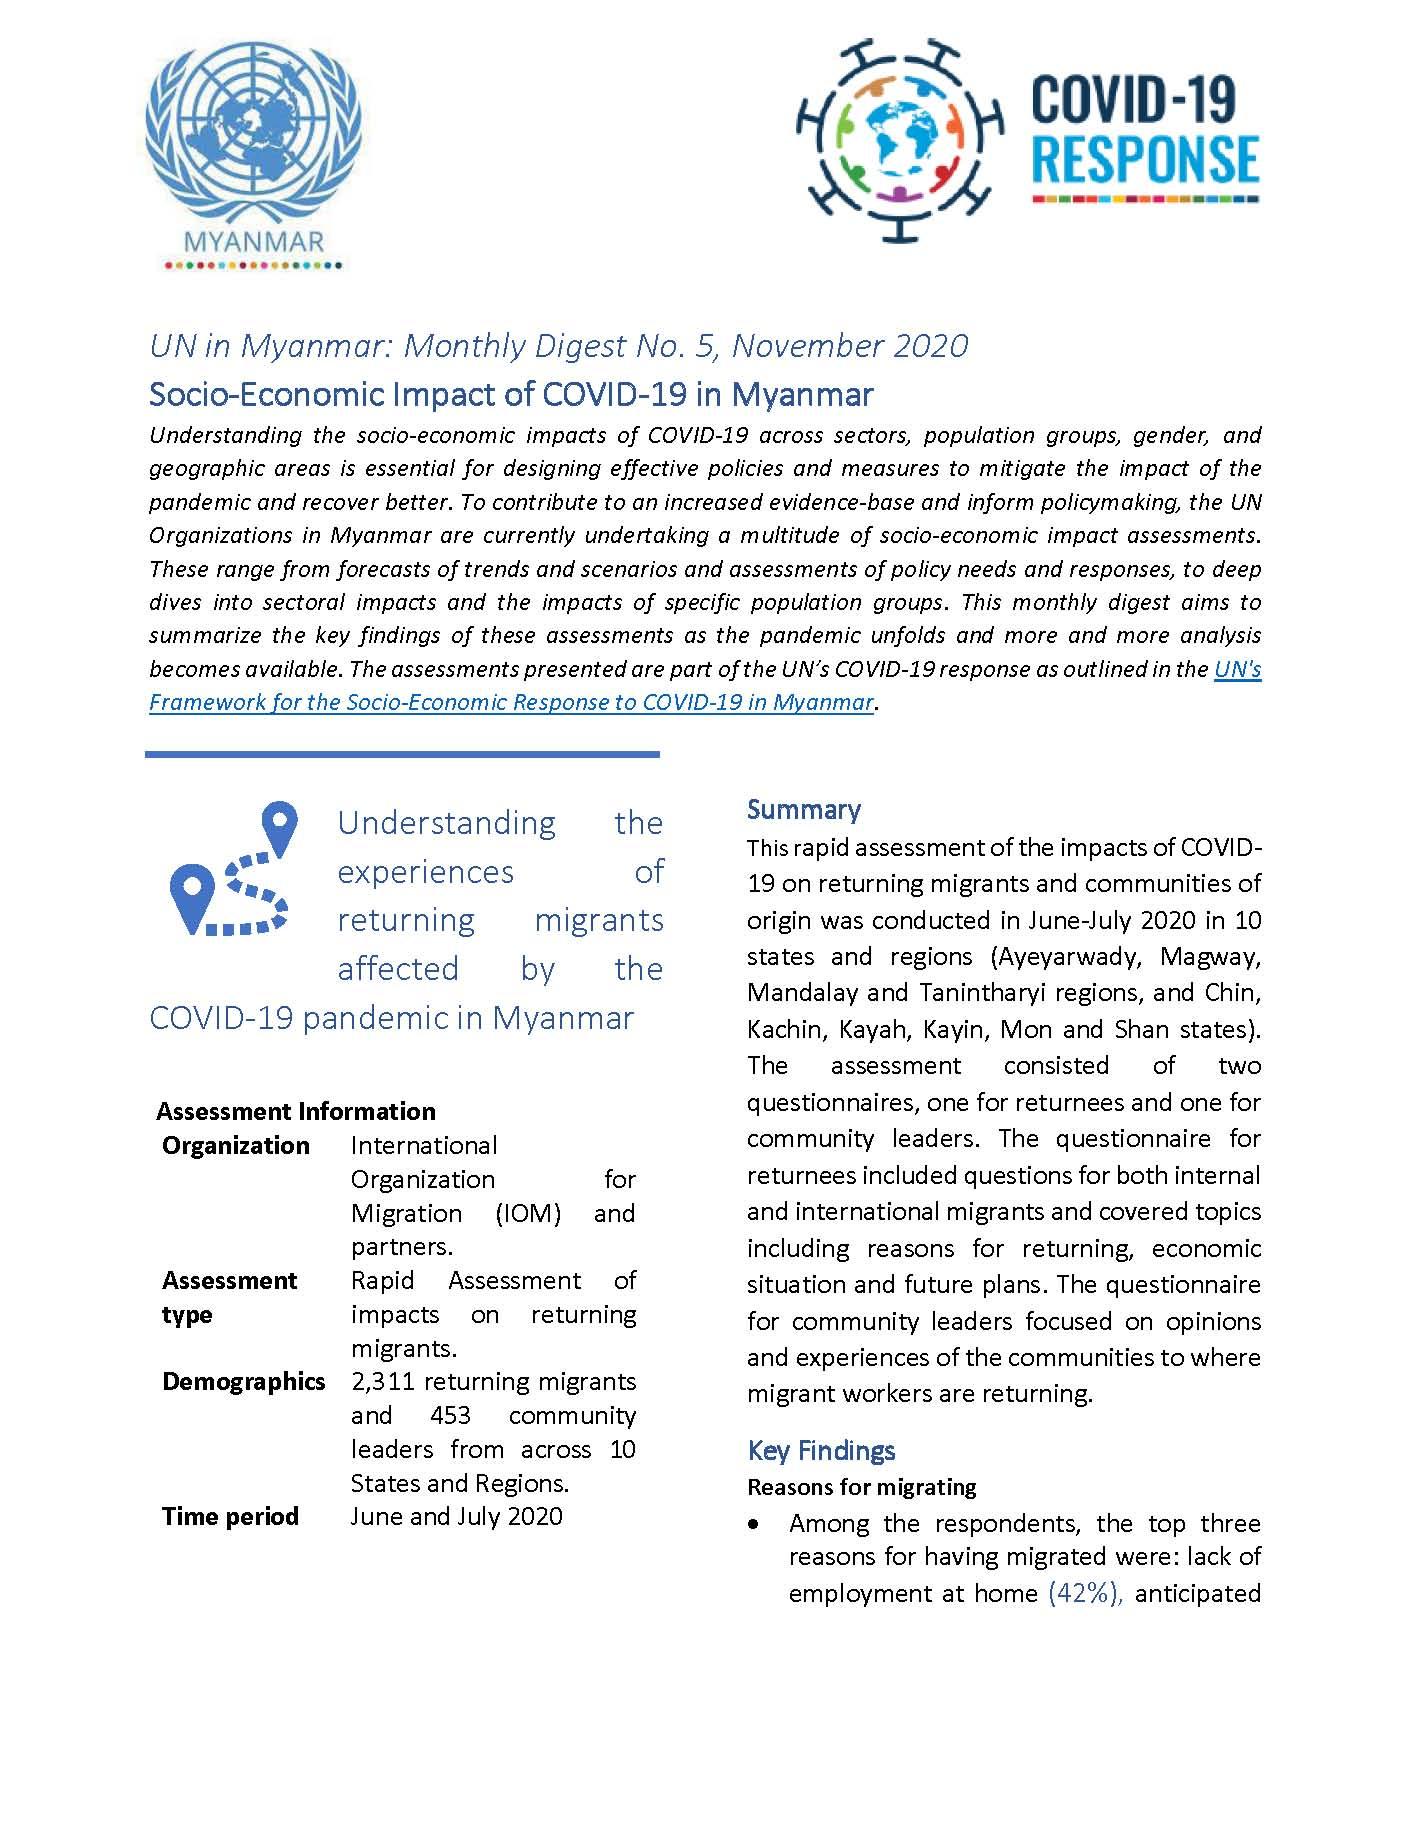 UN in Myanmar: Monthly Digest No. 5, November 2020 Socio-Economic Impact of COVID-19 in Myanmar